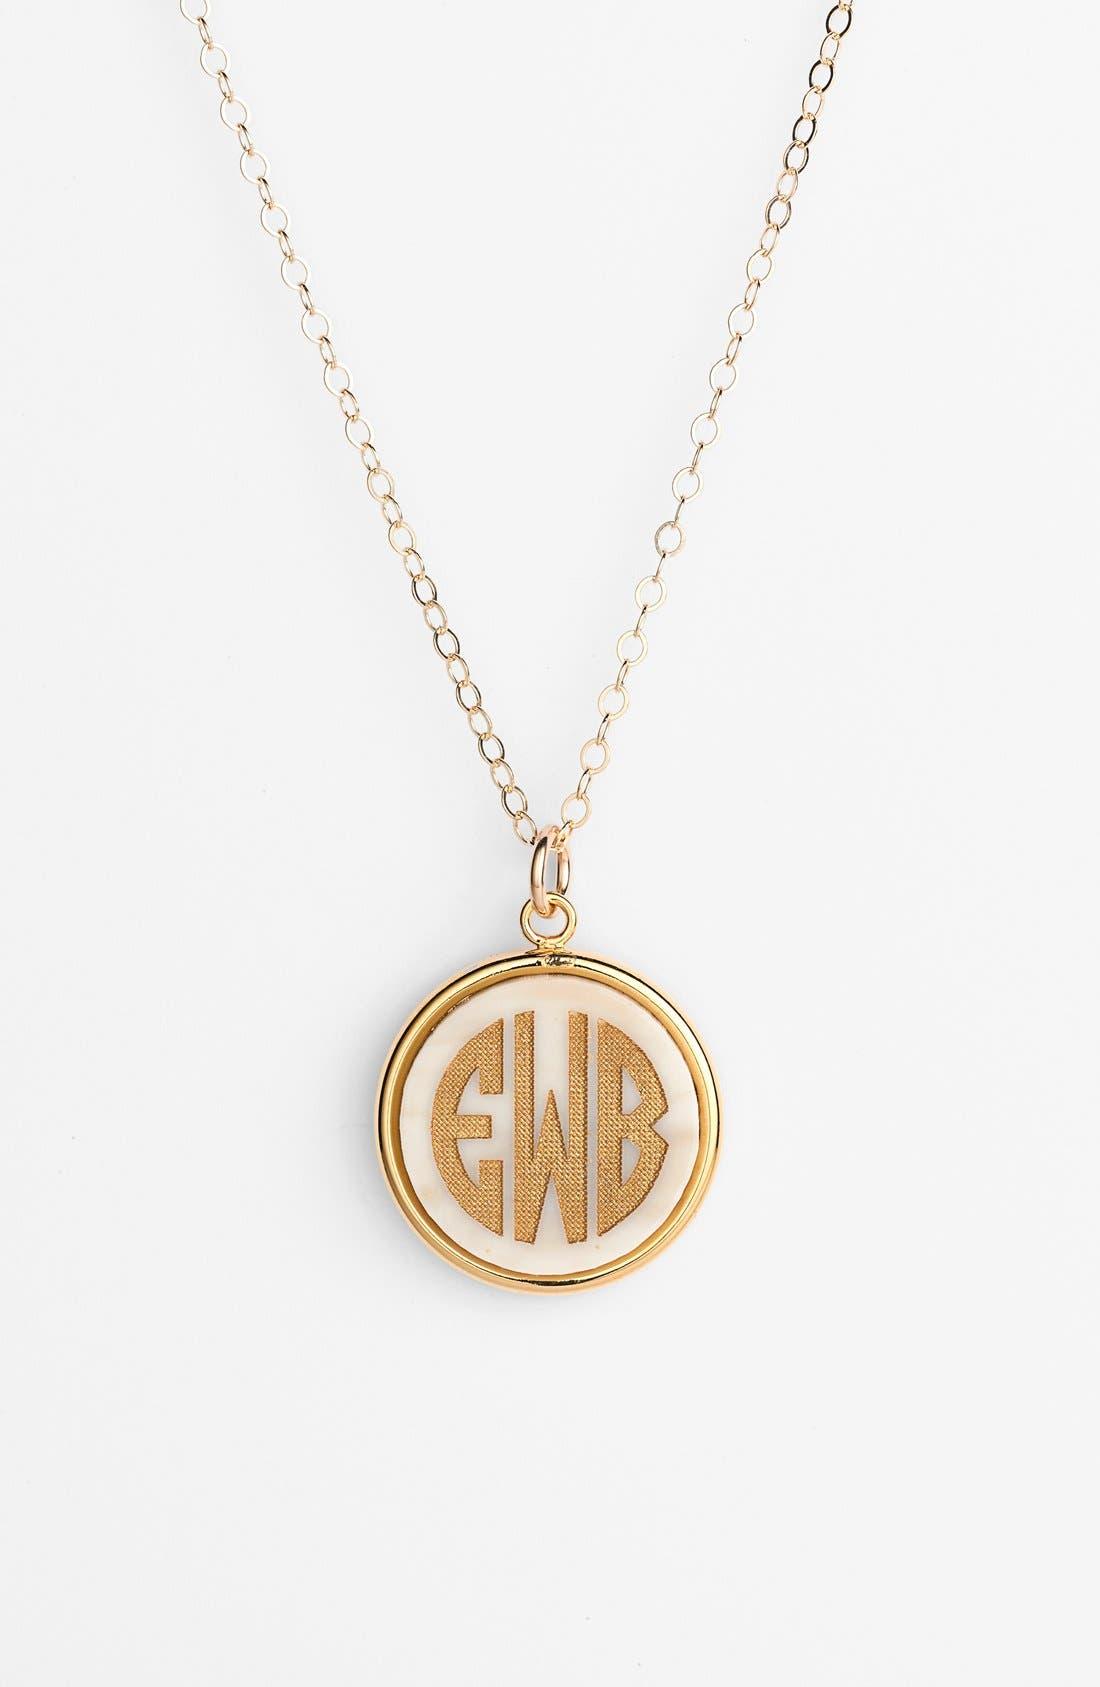 Main Image - Moon and Lola 'Vineyard' Personalized Monogram Pendant Necklace